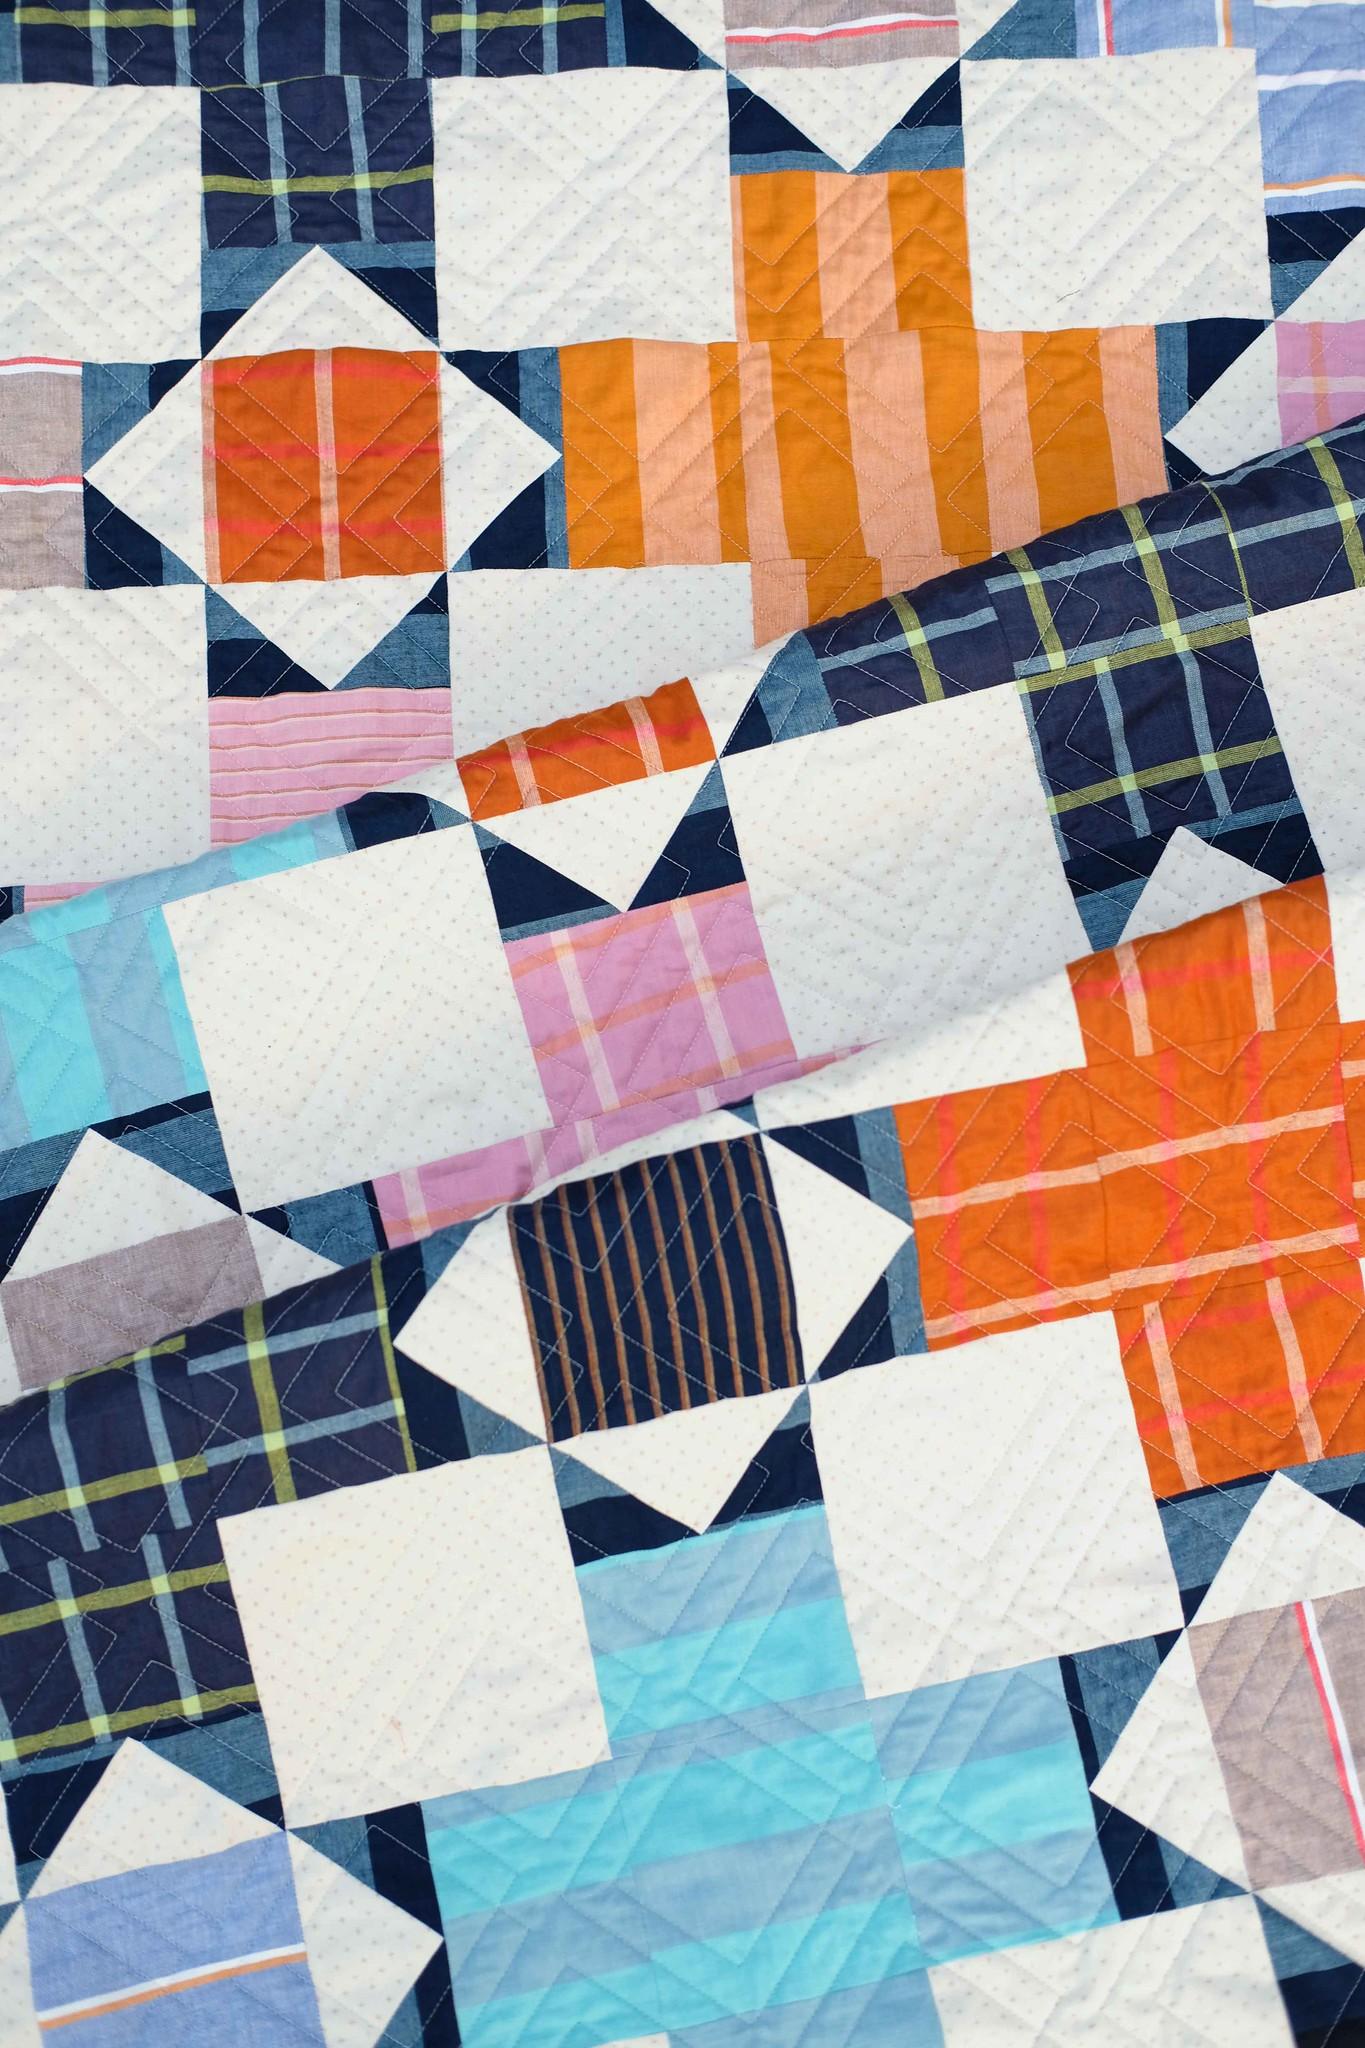 The Hazel Quilt in Warp & Weft Heirloom - Kitchen Table Quilting